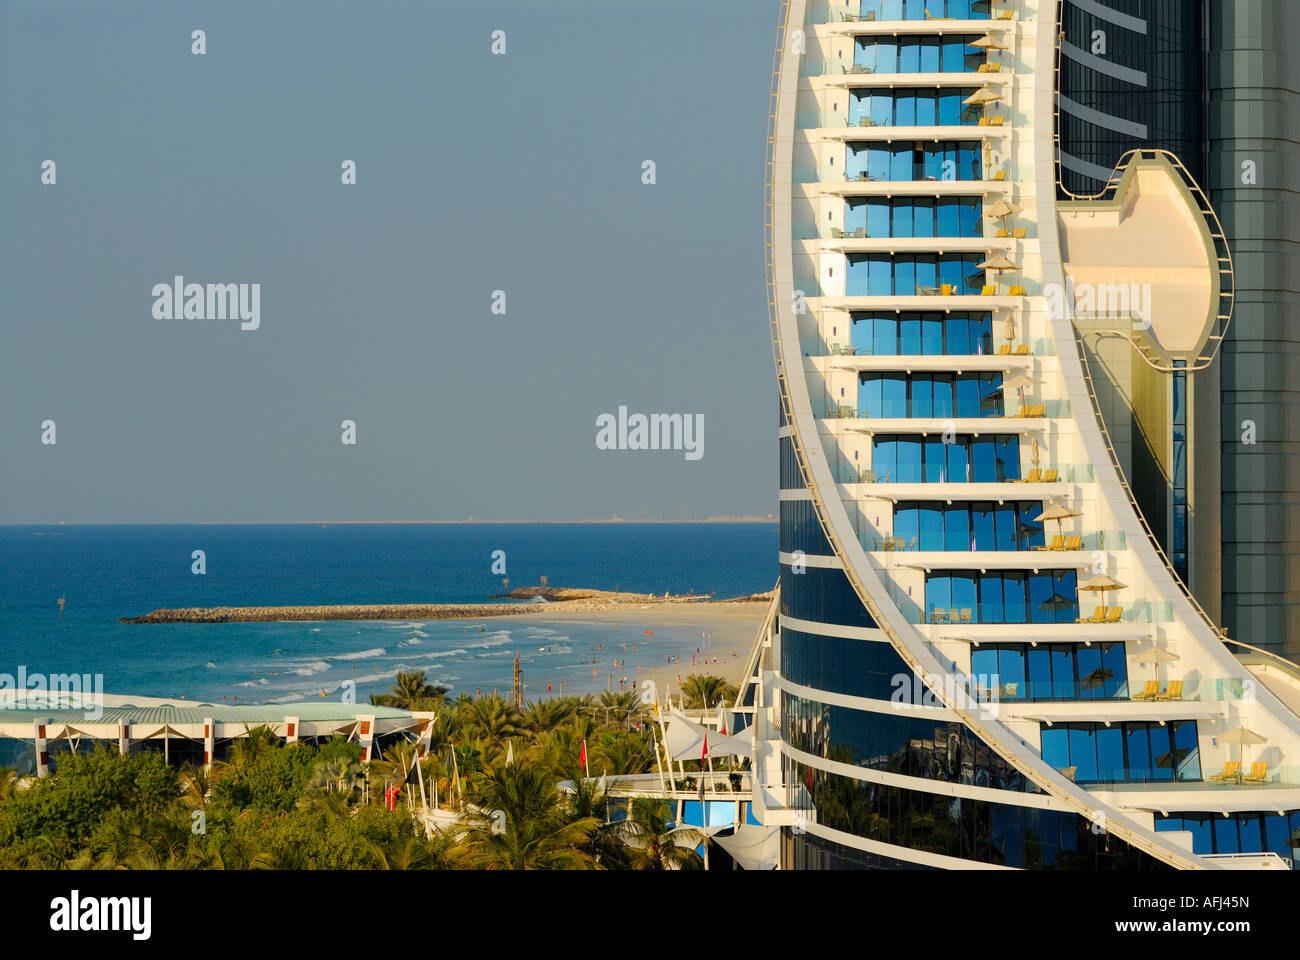 Chambres avec balcon, l'hôtel Jumeirah Beach Hotel, Dubai, Émirats Arabes Unis Photo Stock